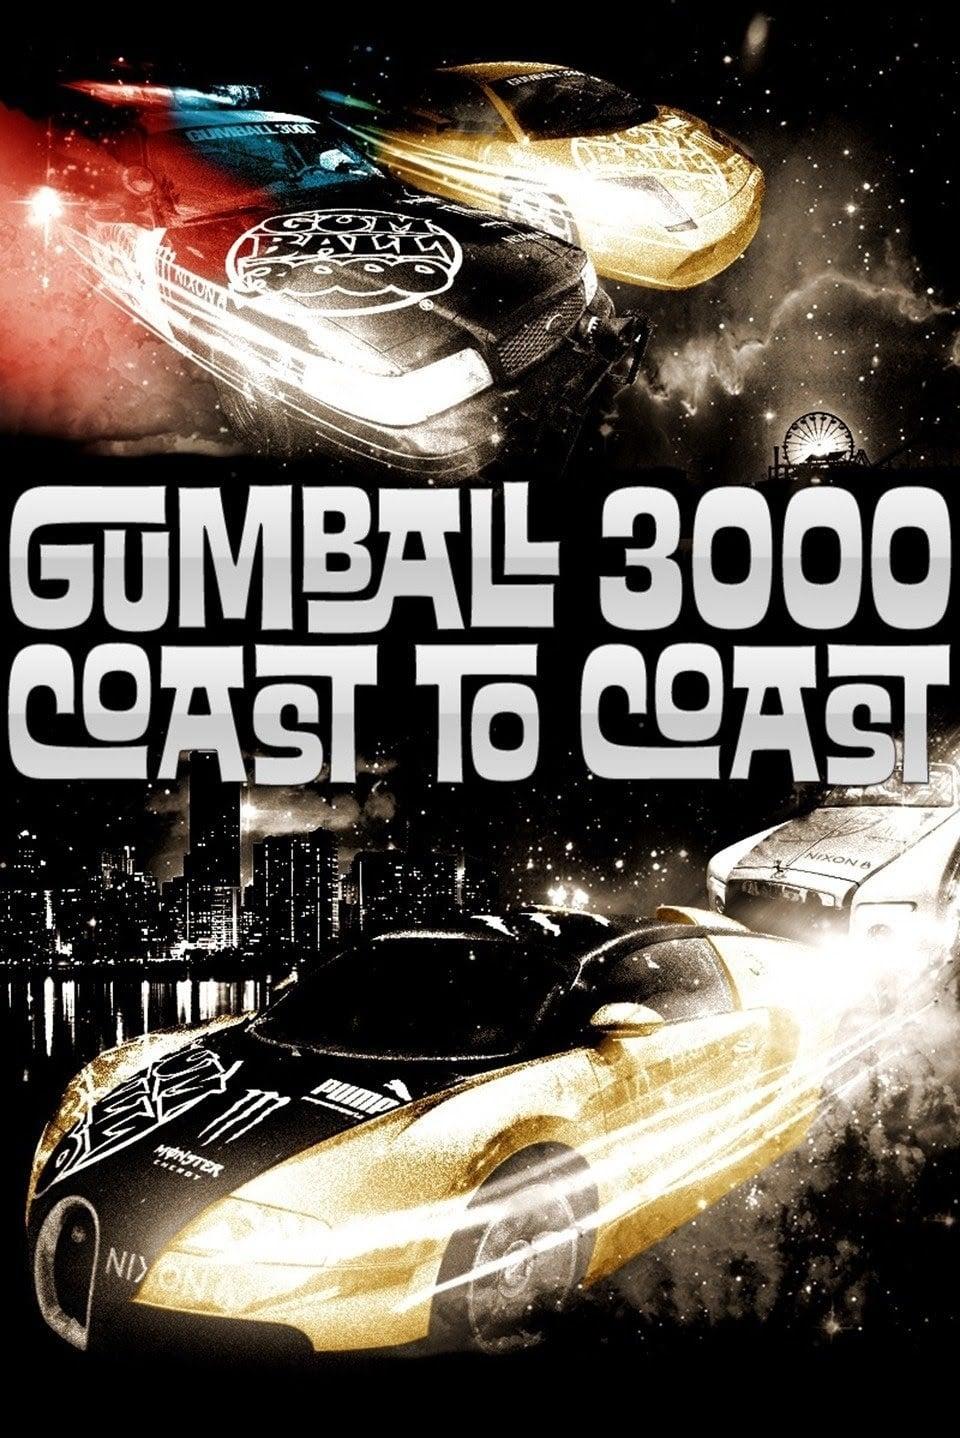 Gumball 3000 - Coast to Coast